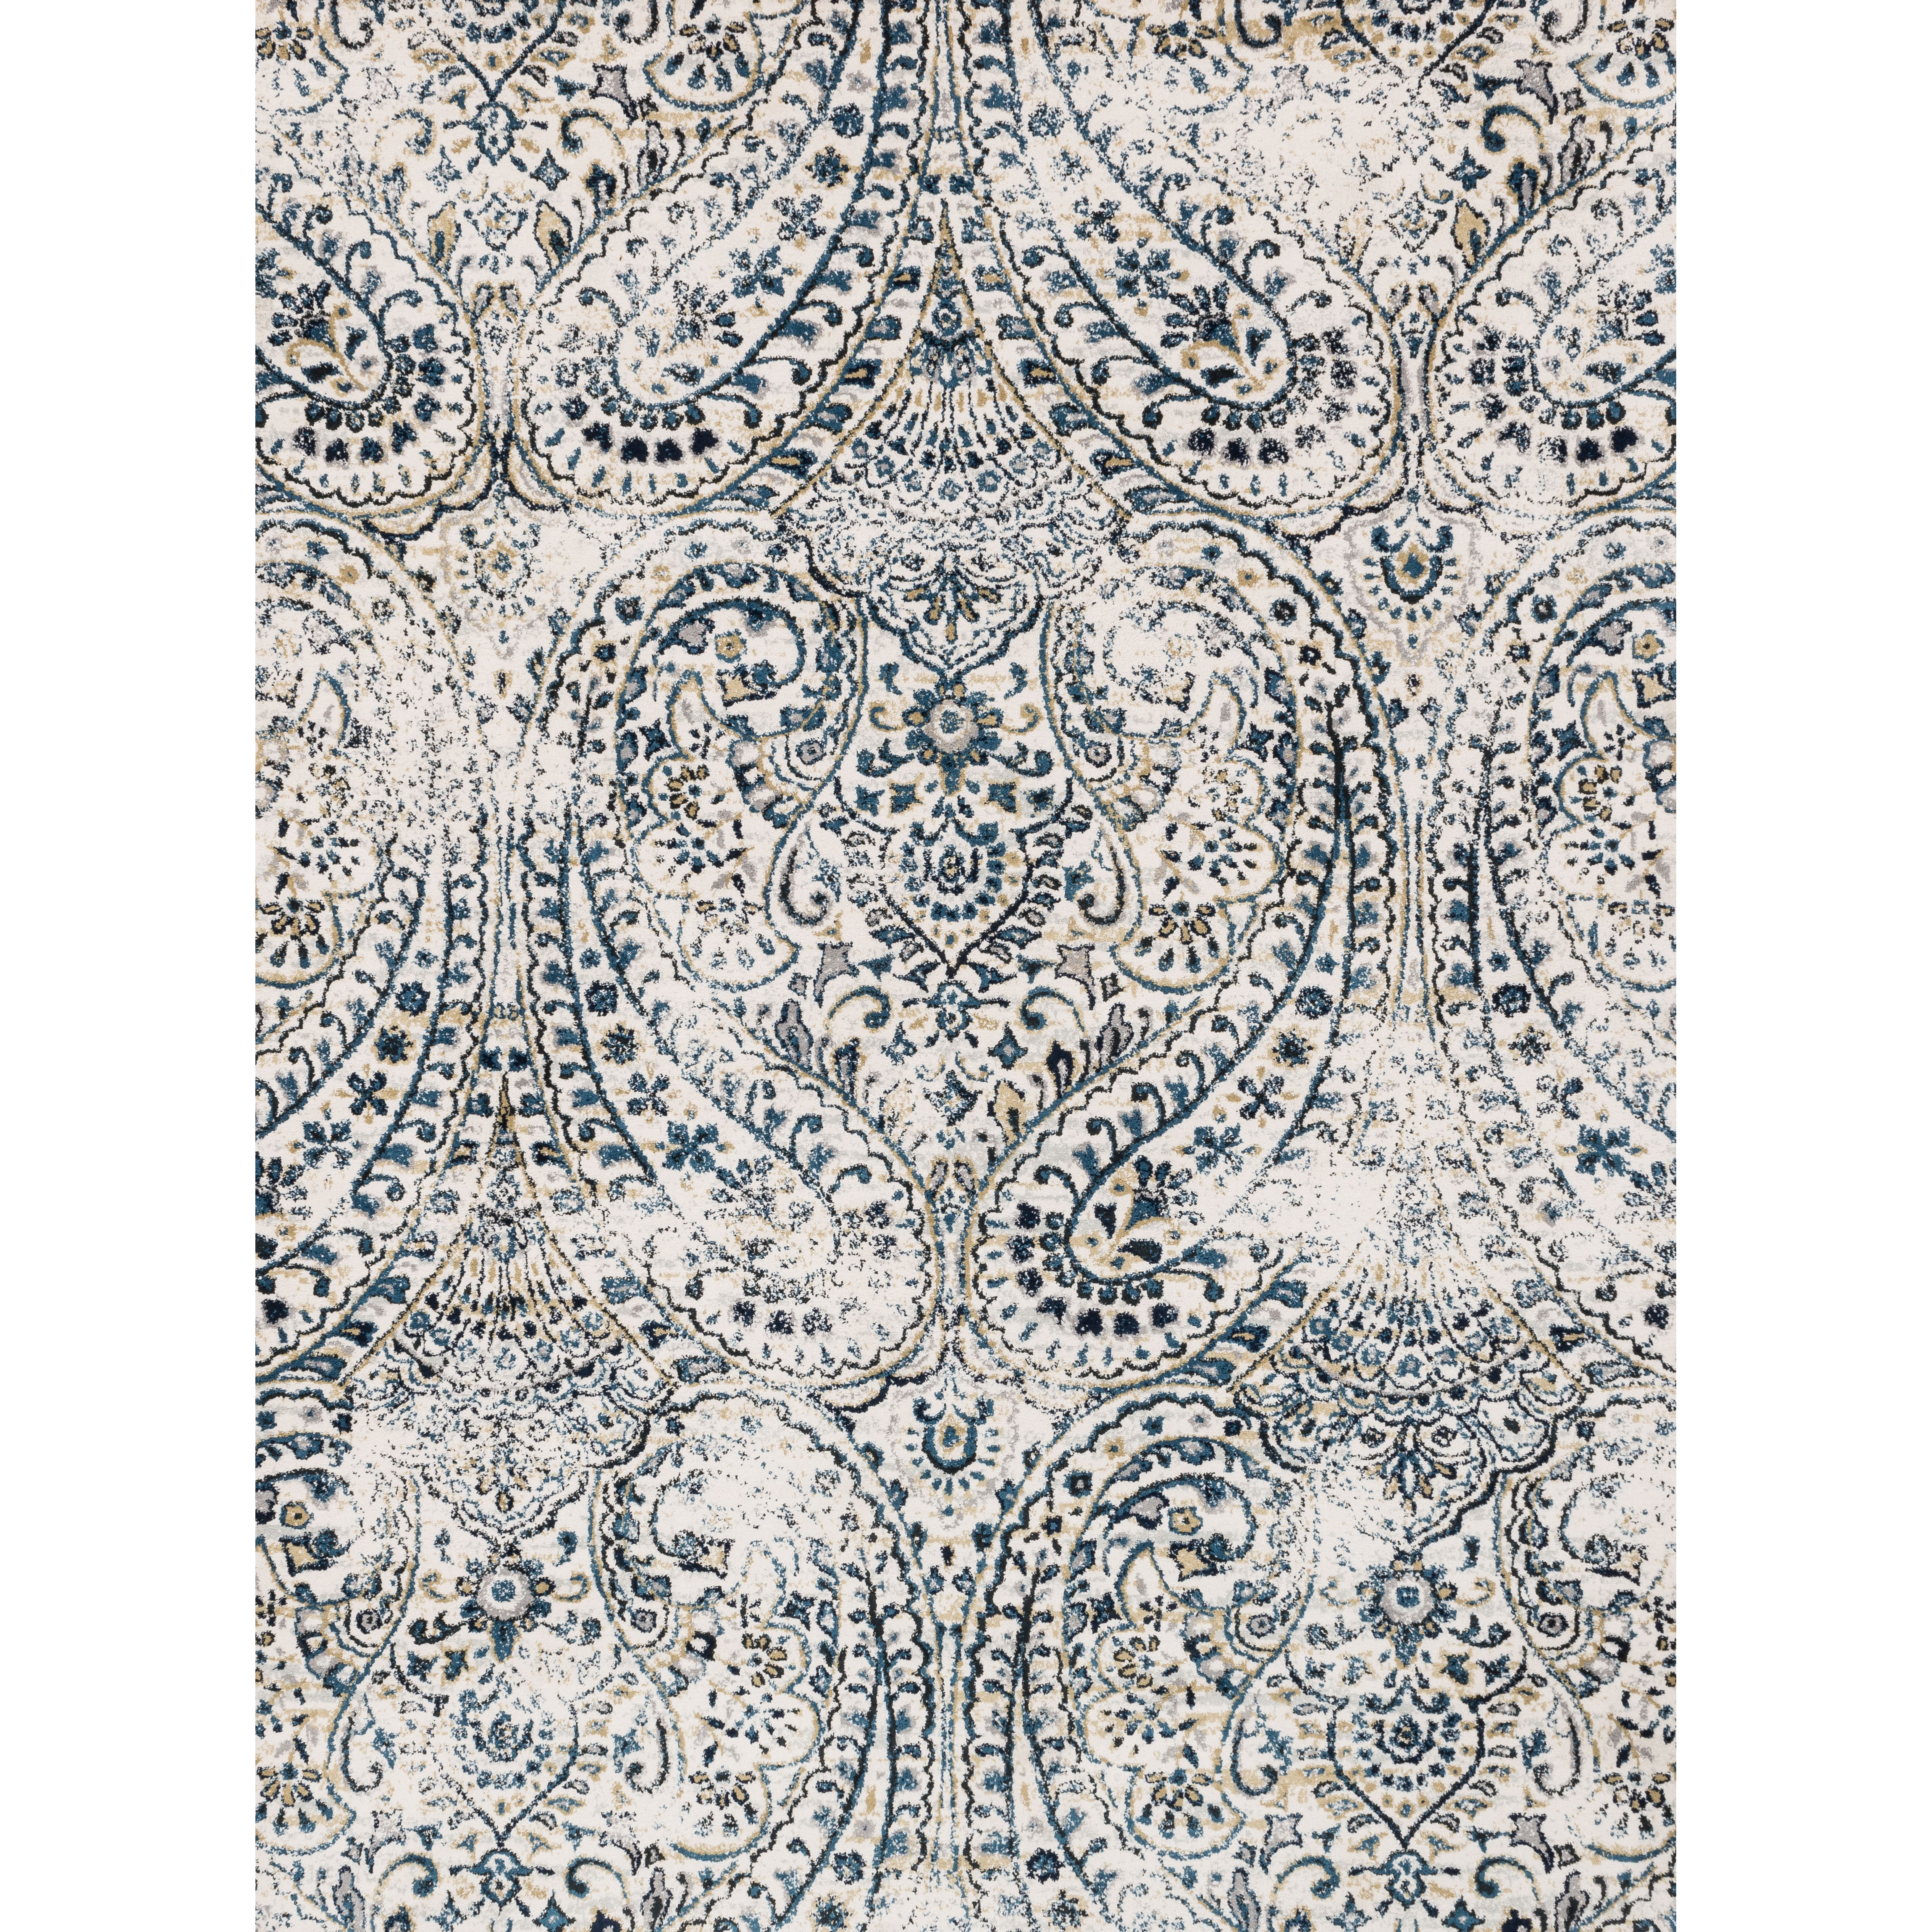 Amazing Loloi Rugs Torrance Ivory/Indigo Area Rug loloi area rugs